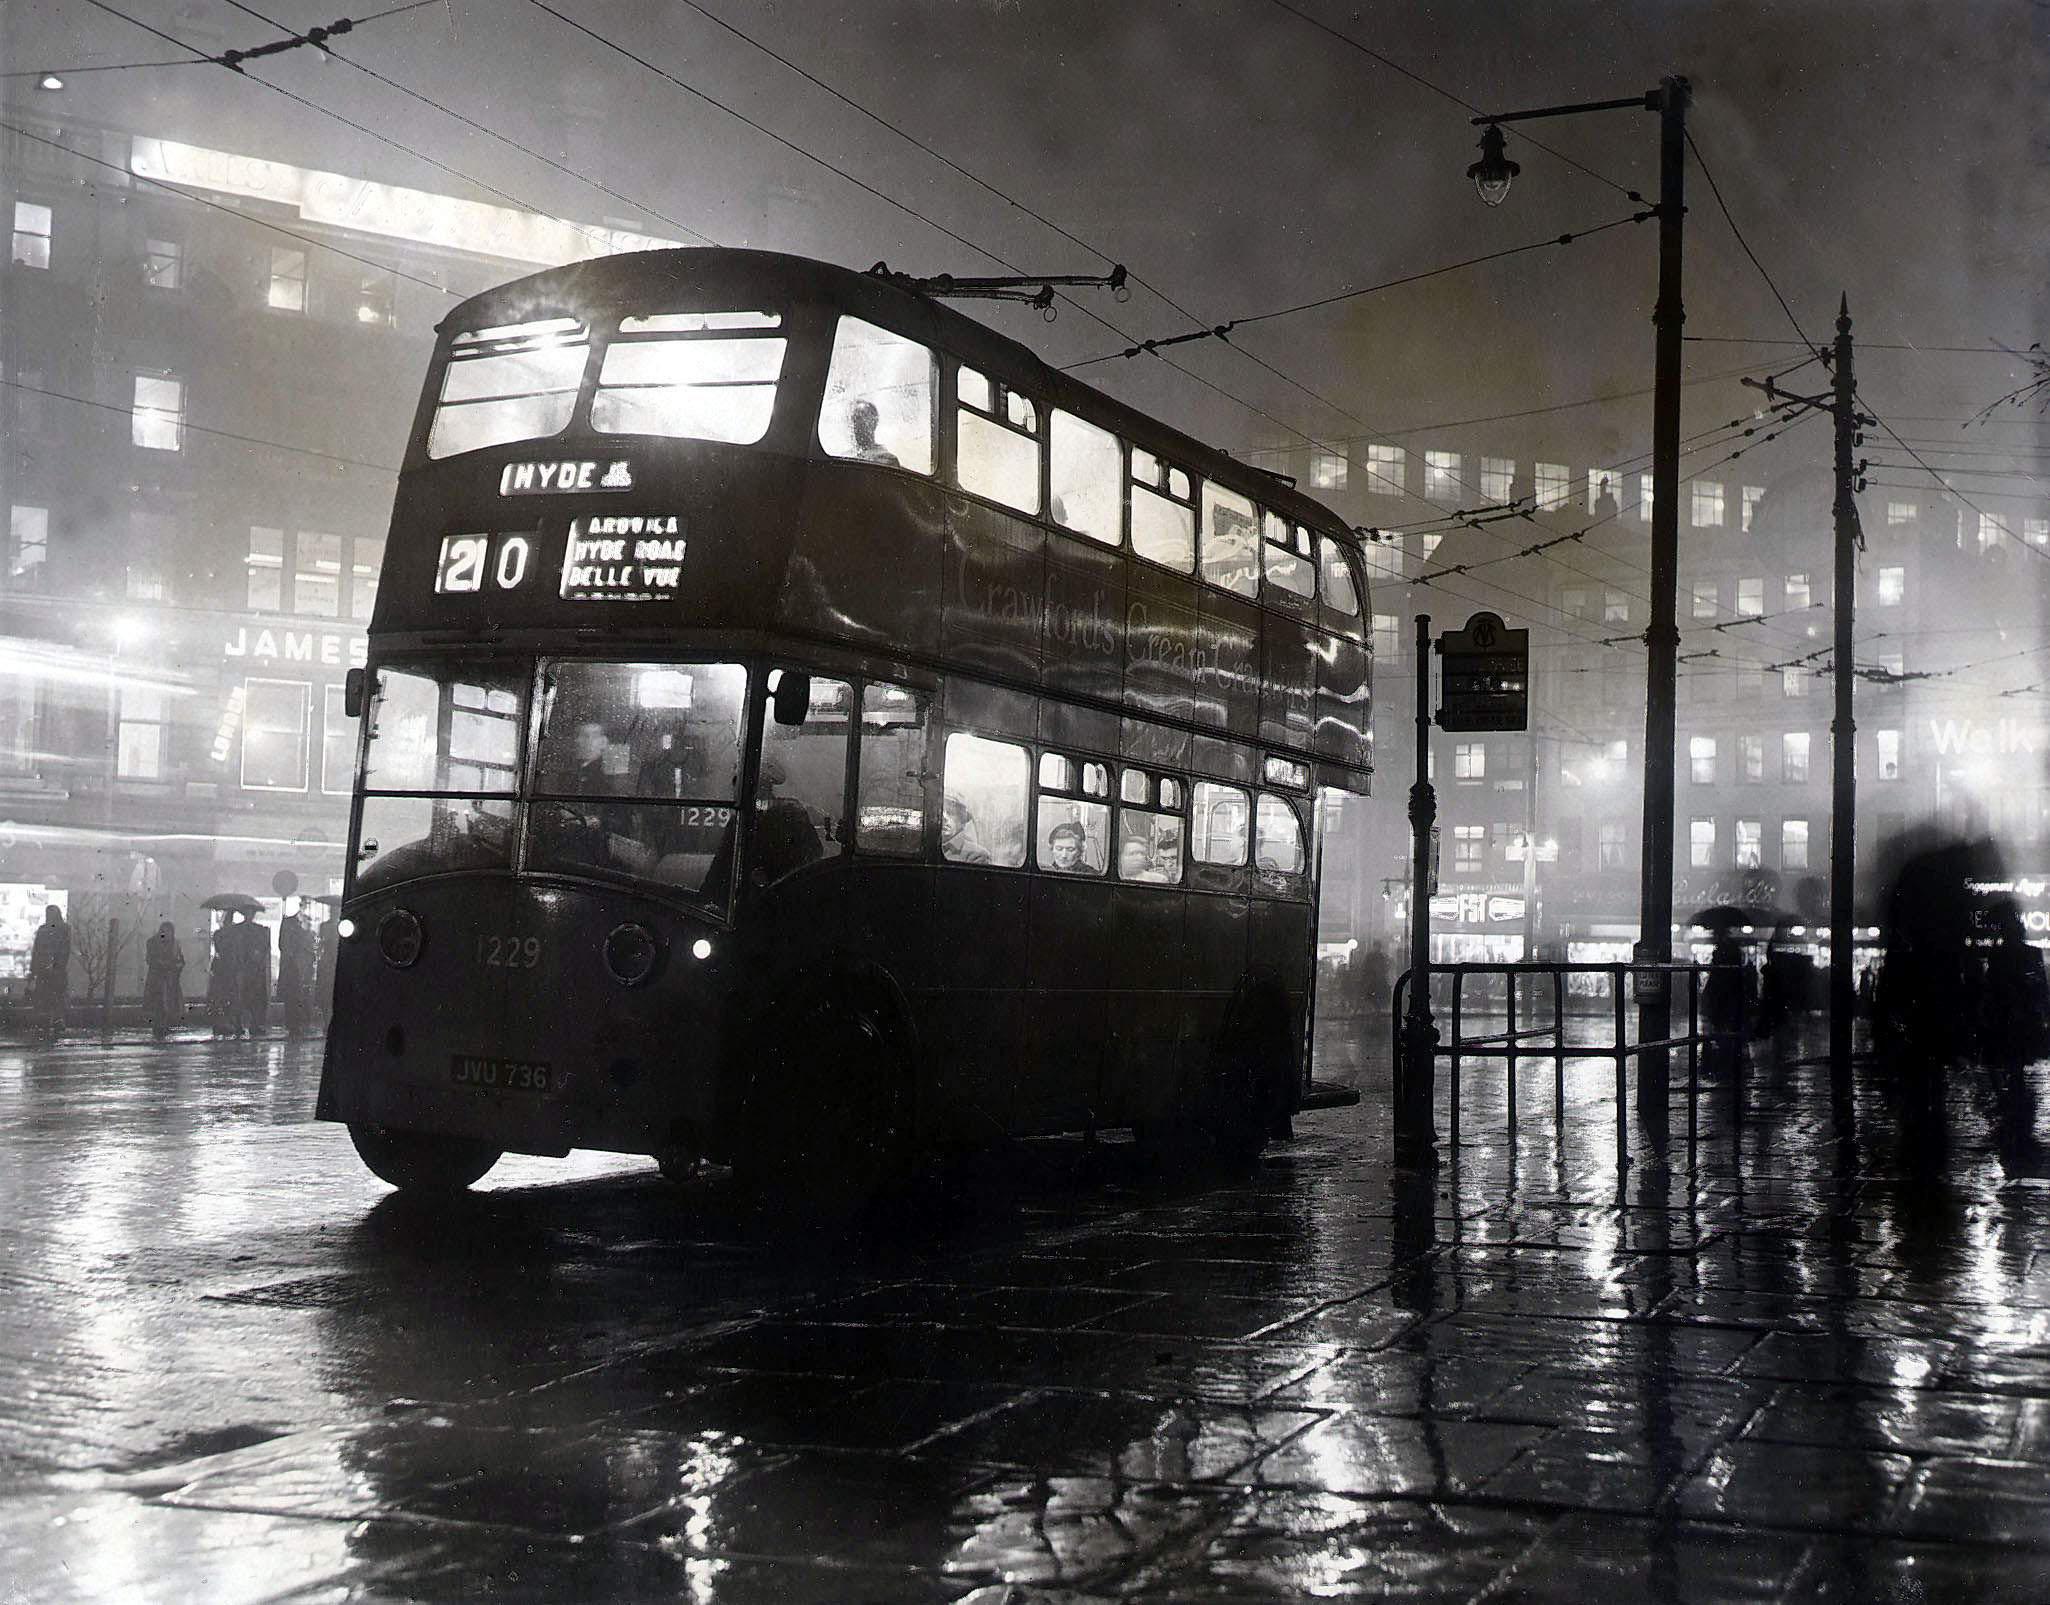 smog bus Hyde -  Trinity Mirror  Mirrorpix  Alamy Stock Photo.jpg